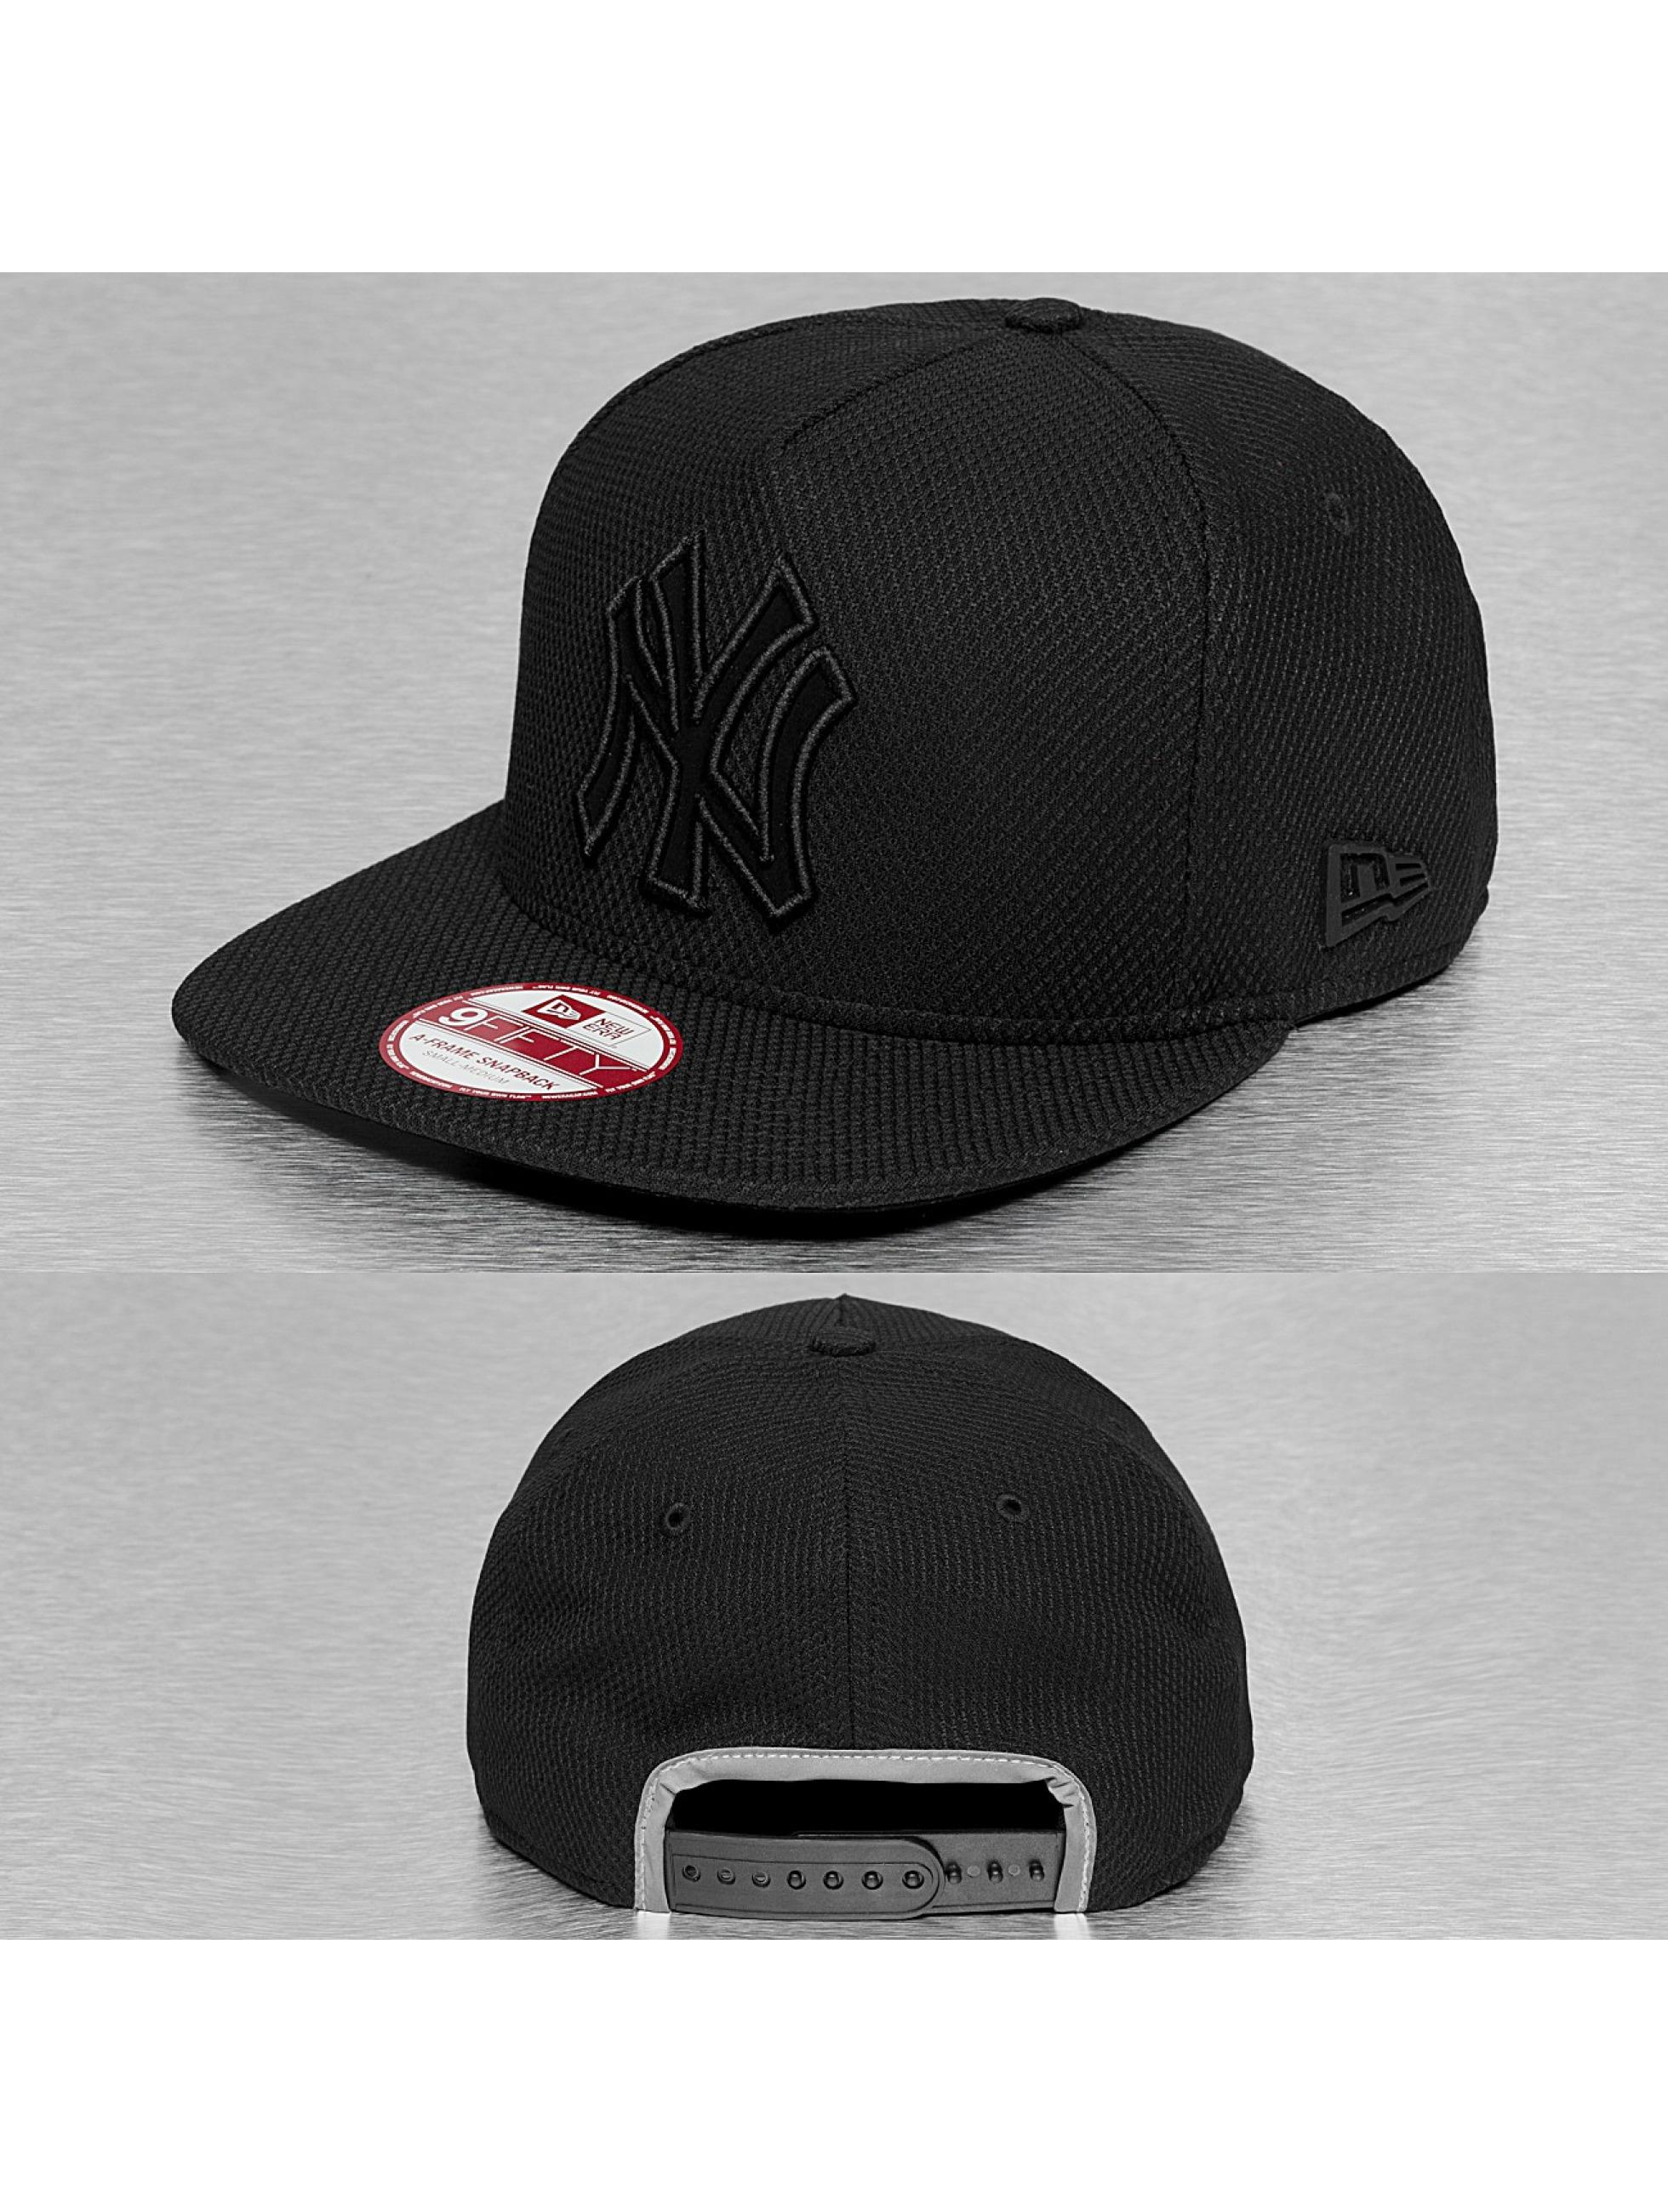 New Era Casquette Snapback & Strapback Diamond Fill NY Yankees noir